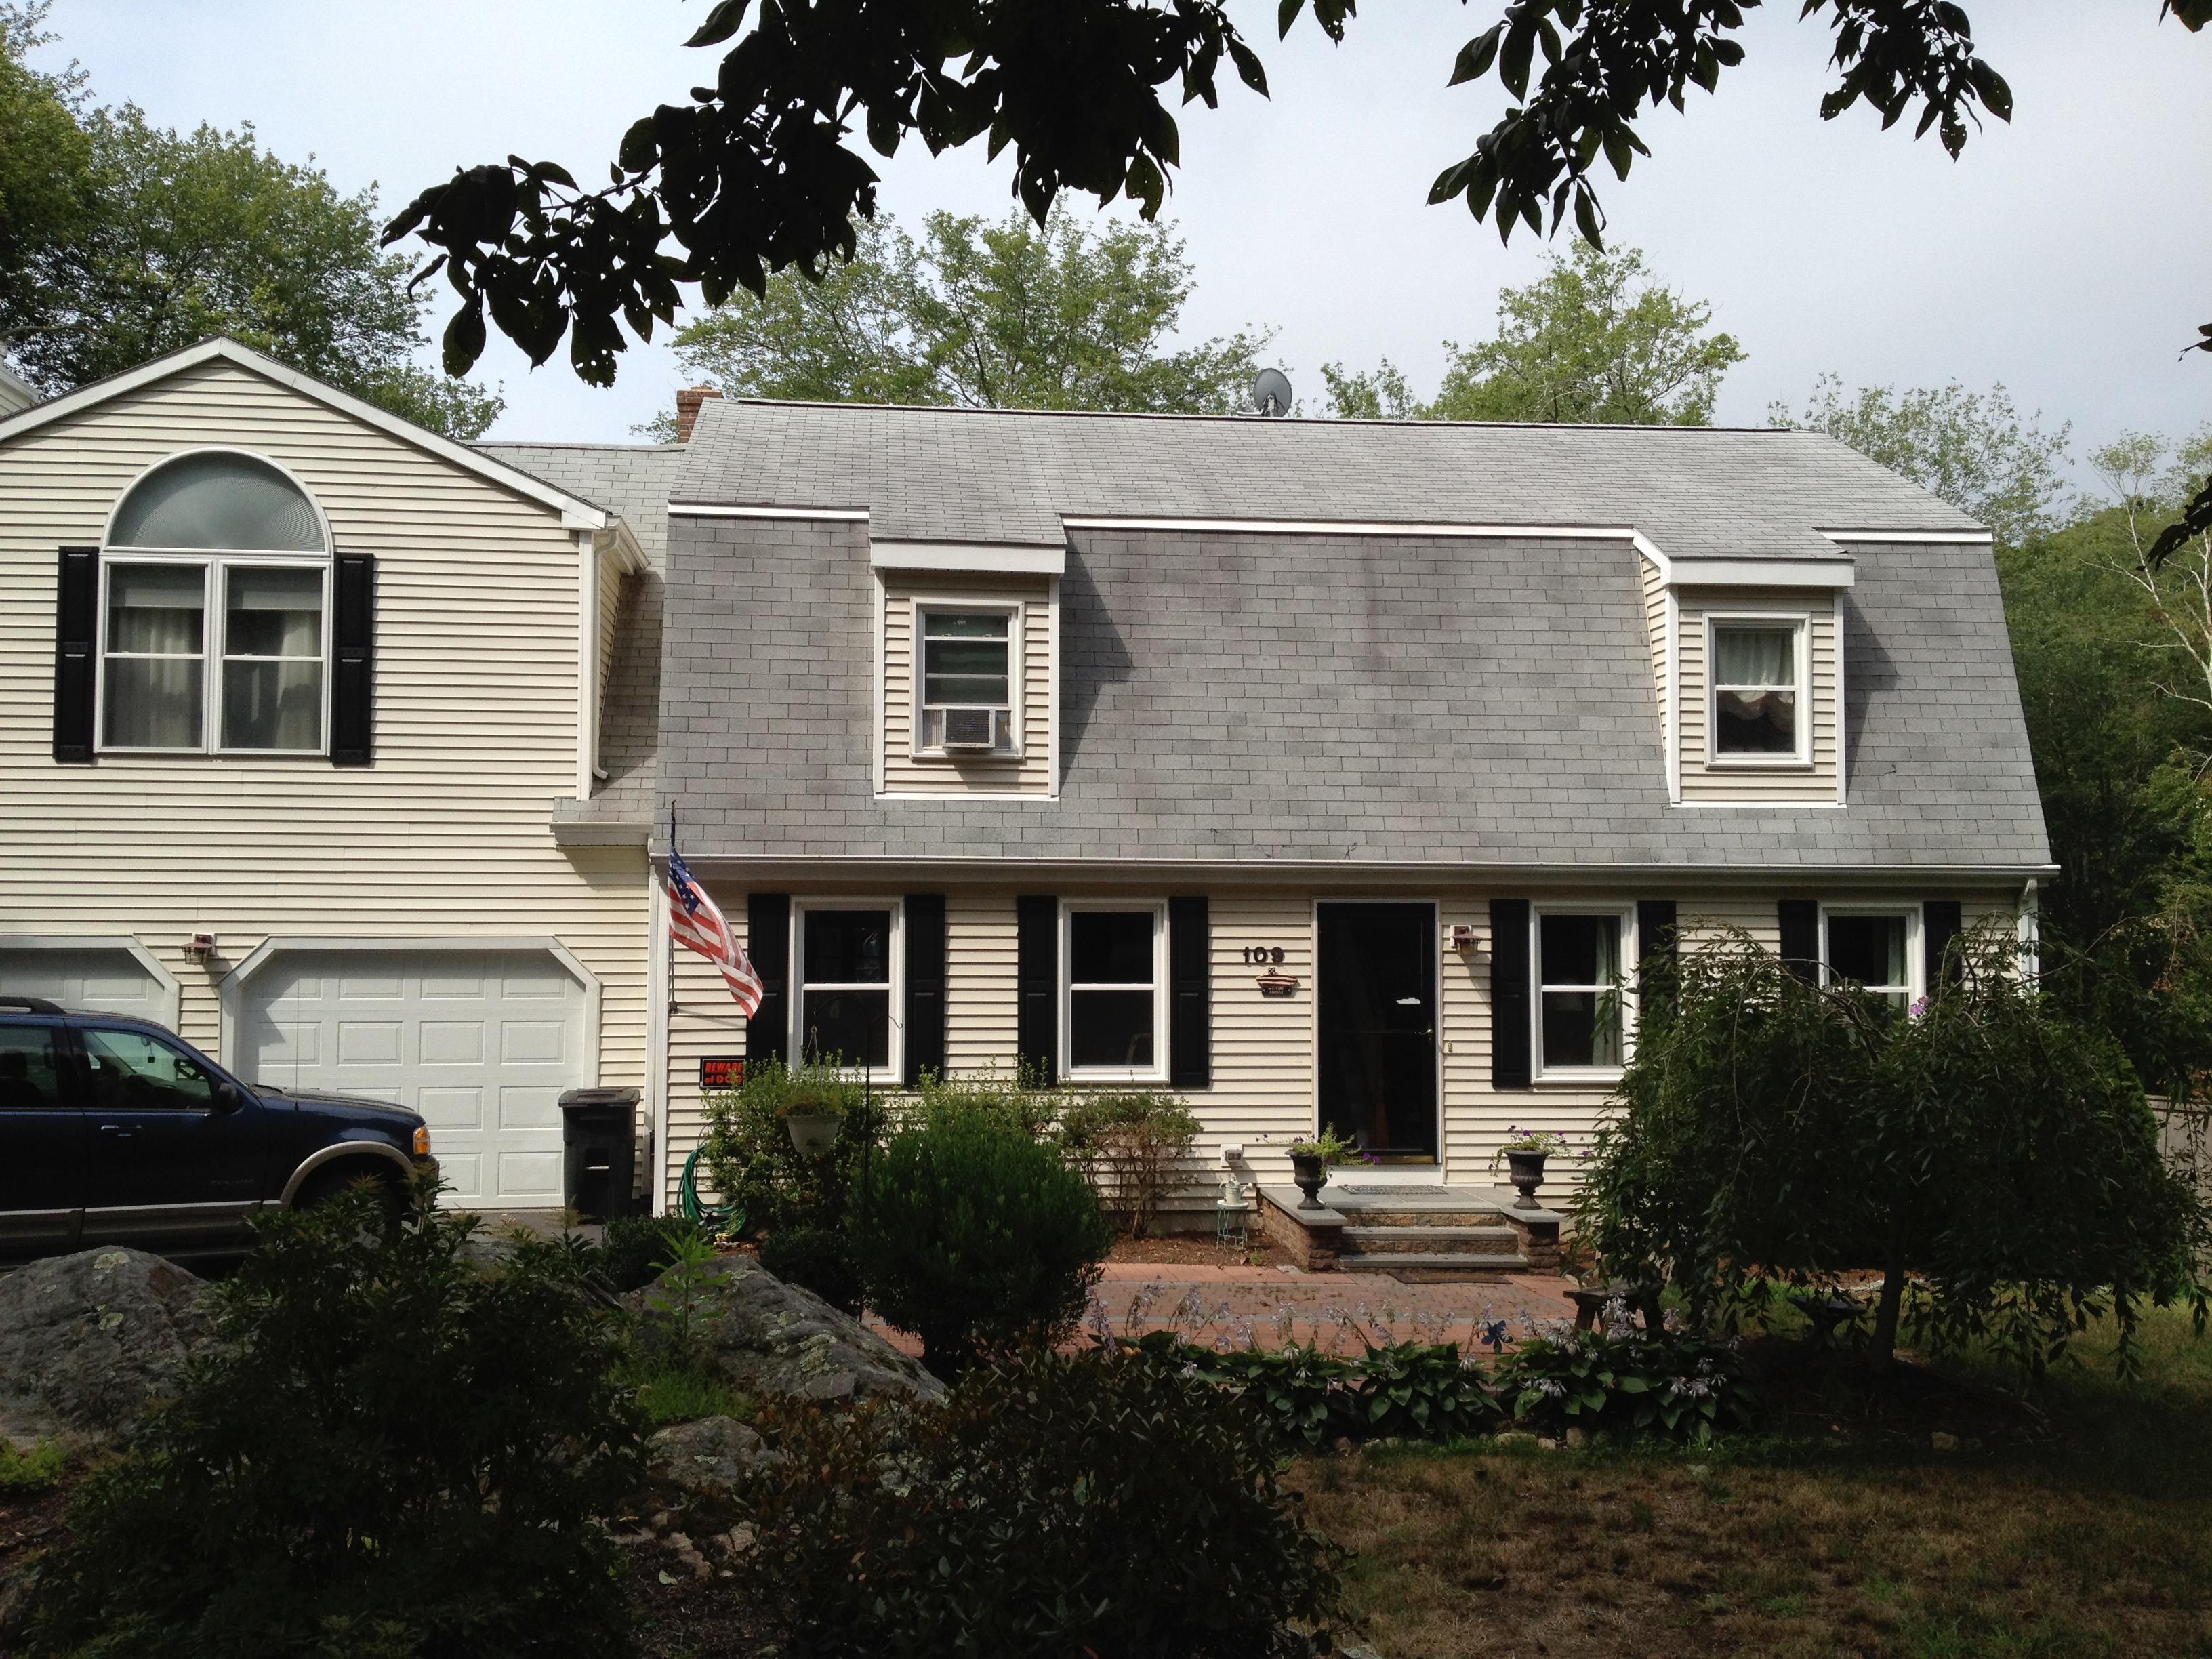 Removed Heavy Black Algae From Roof And Green Algae From Vinyl Siding And  3 Tab Asphalt Shingles In Stonington, Connecticut.